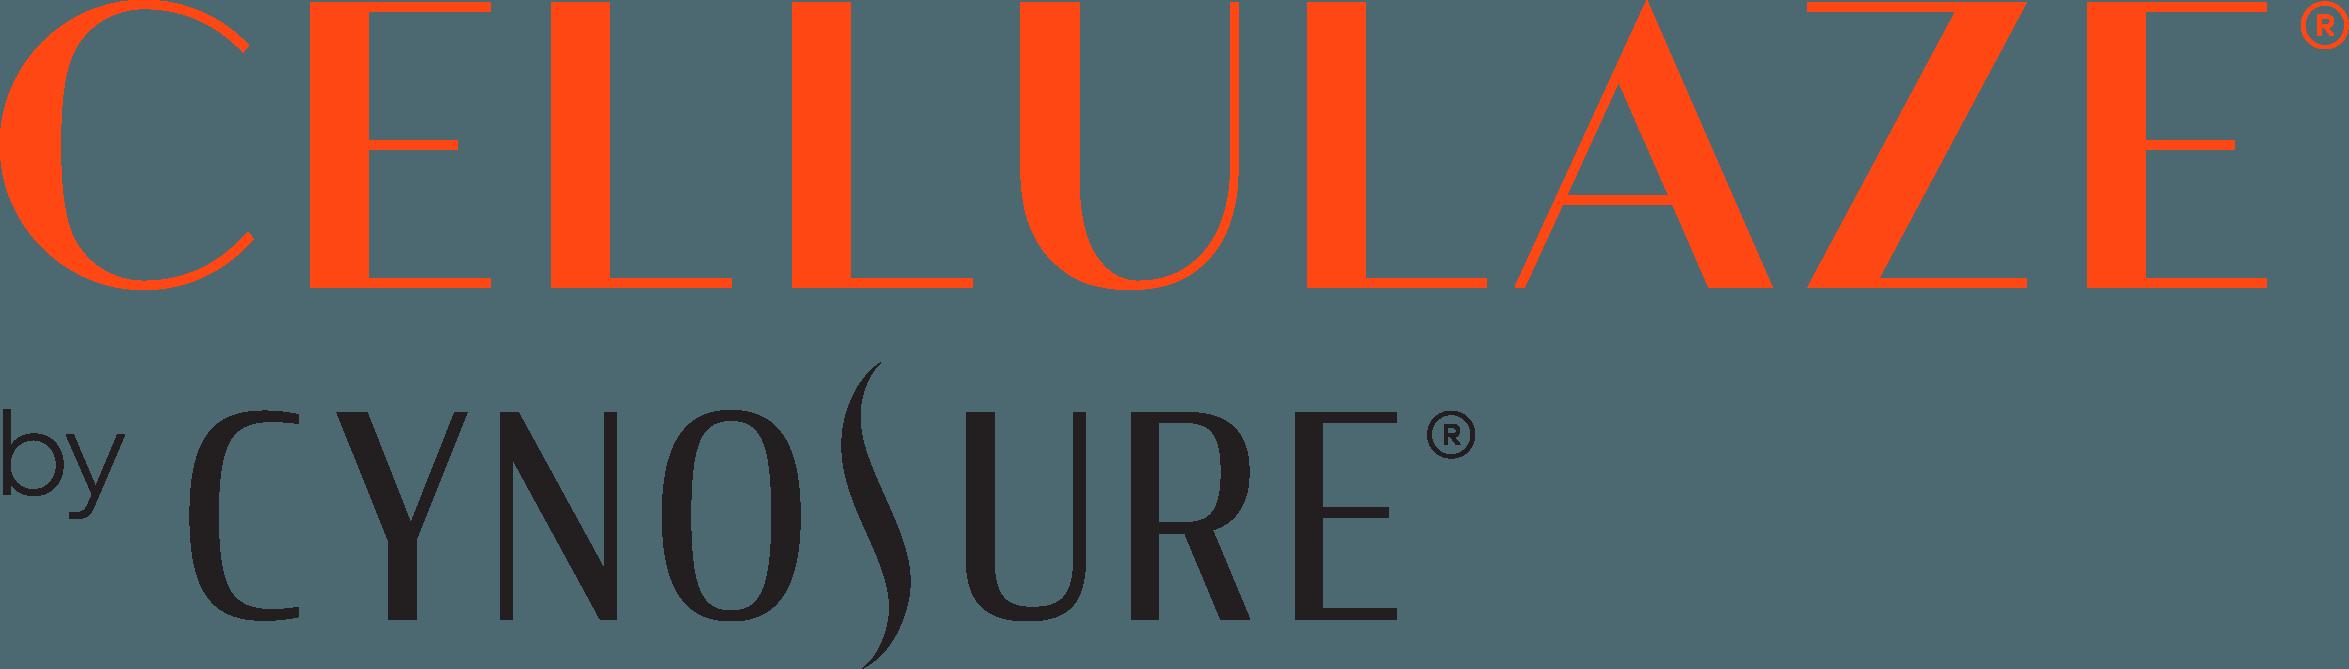 Cellulaze Logo